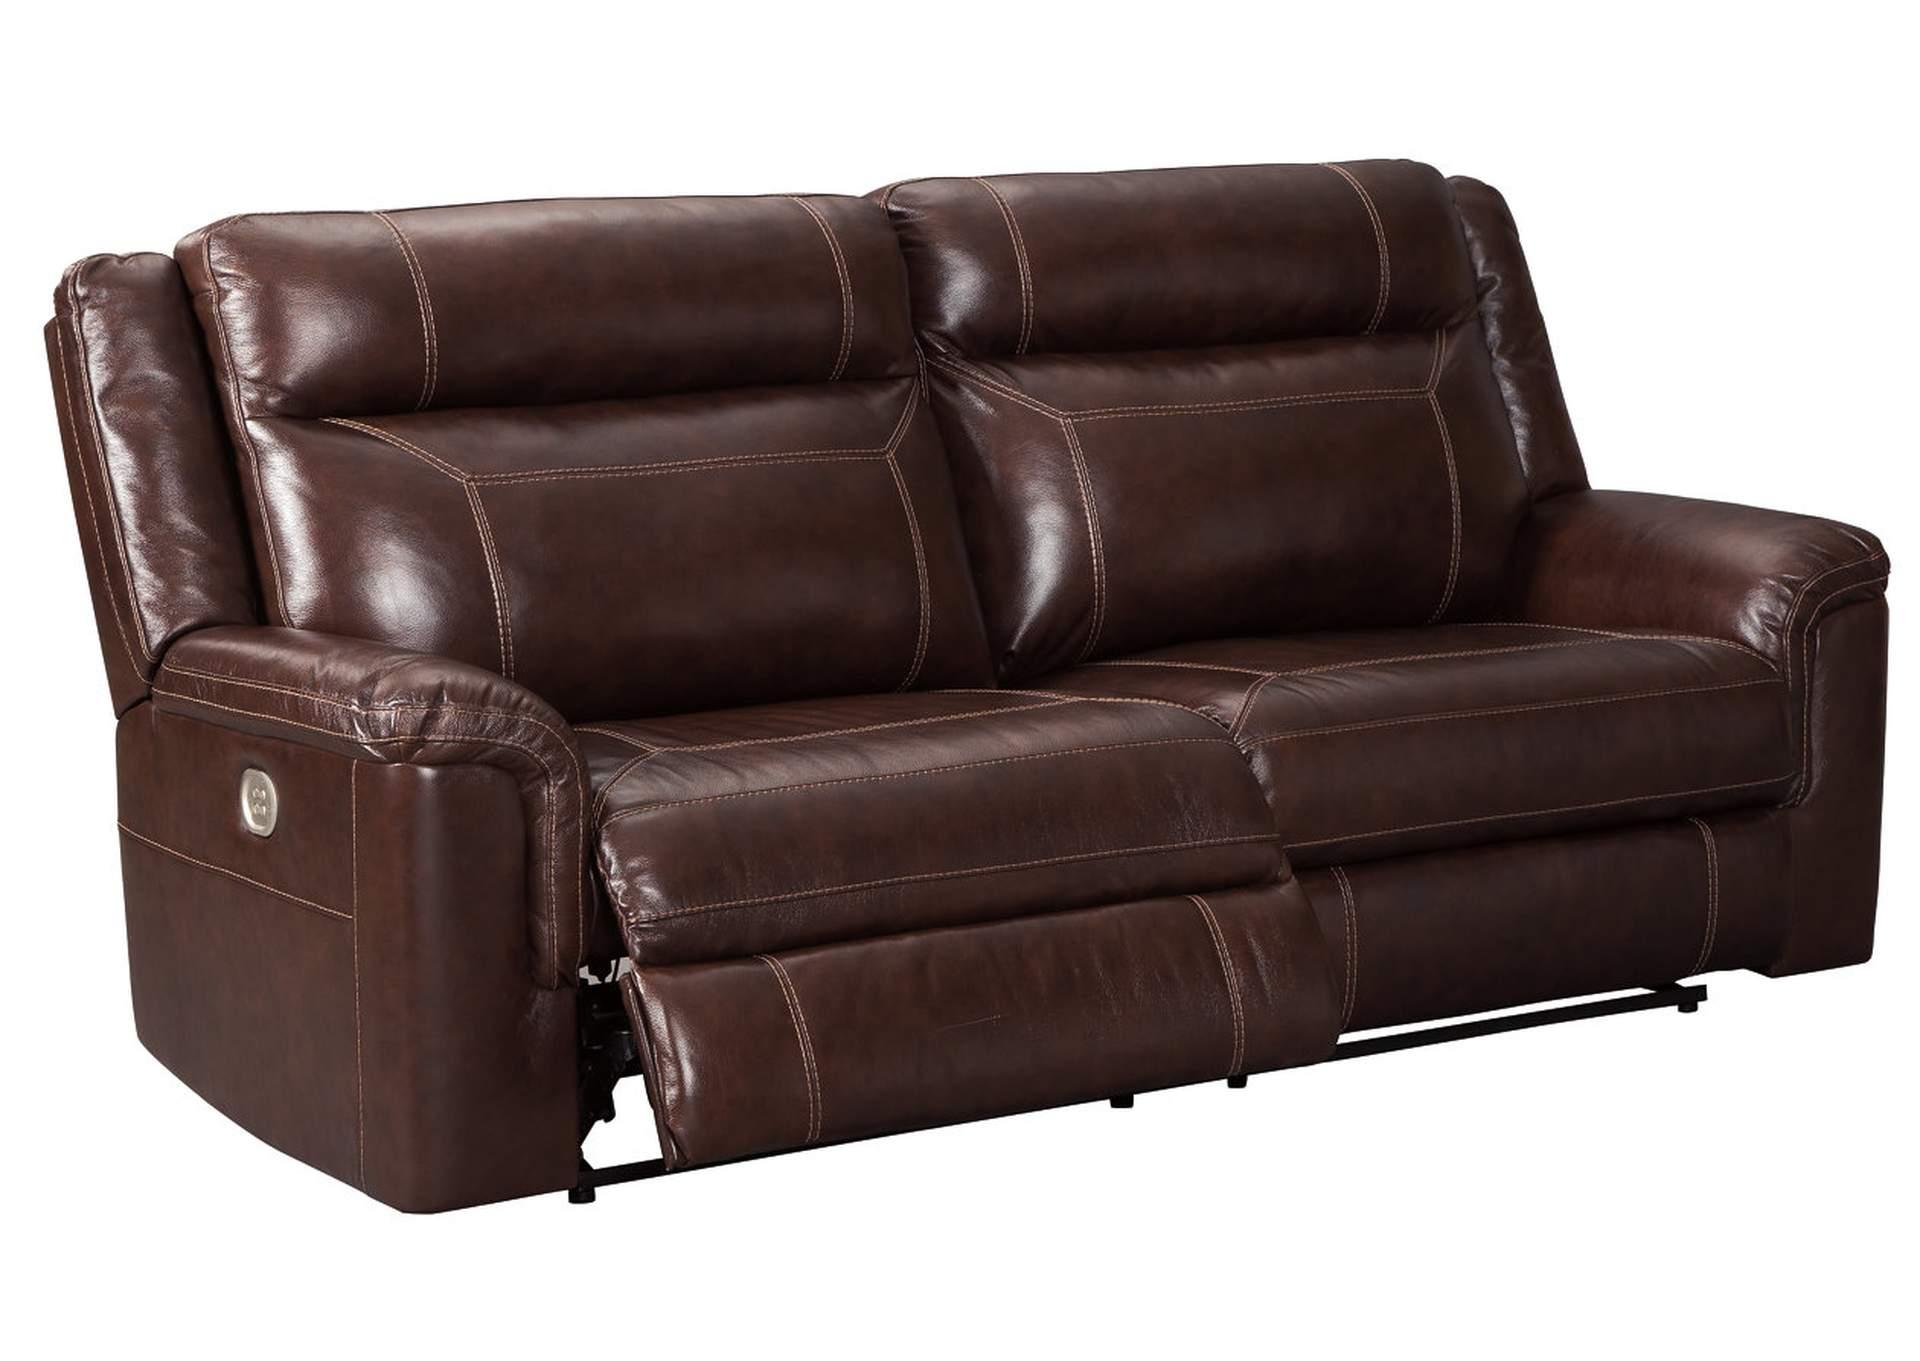 furniture direct bronx manhattan new york city ny wyline coffee